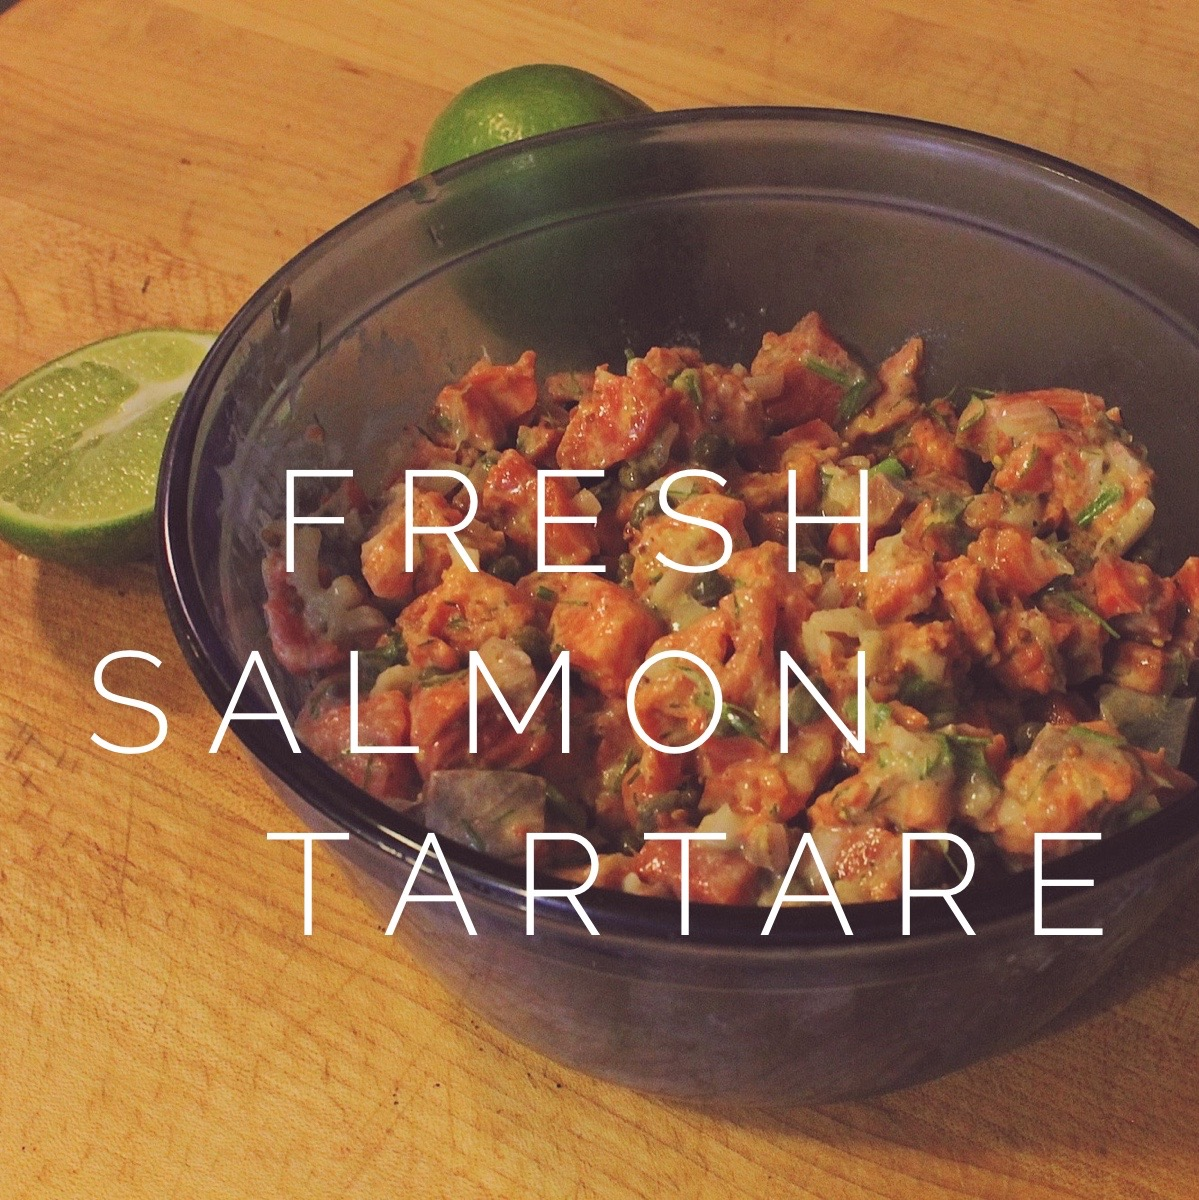 Easy Salmon Tartare Recipe for Your ...